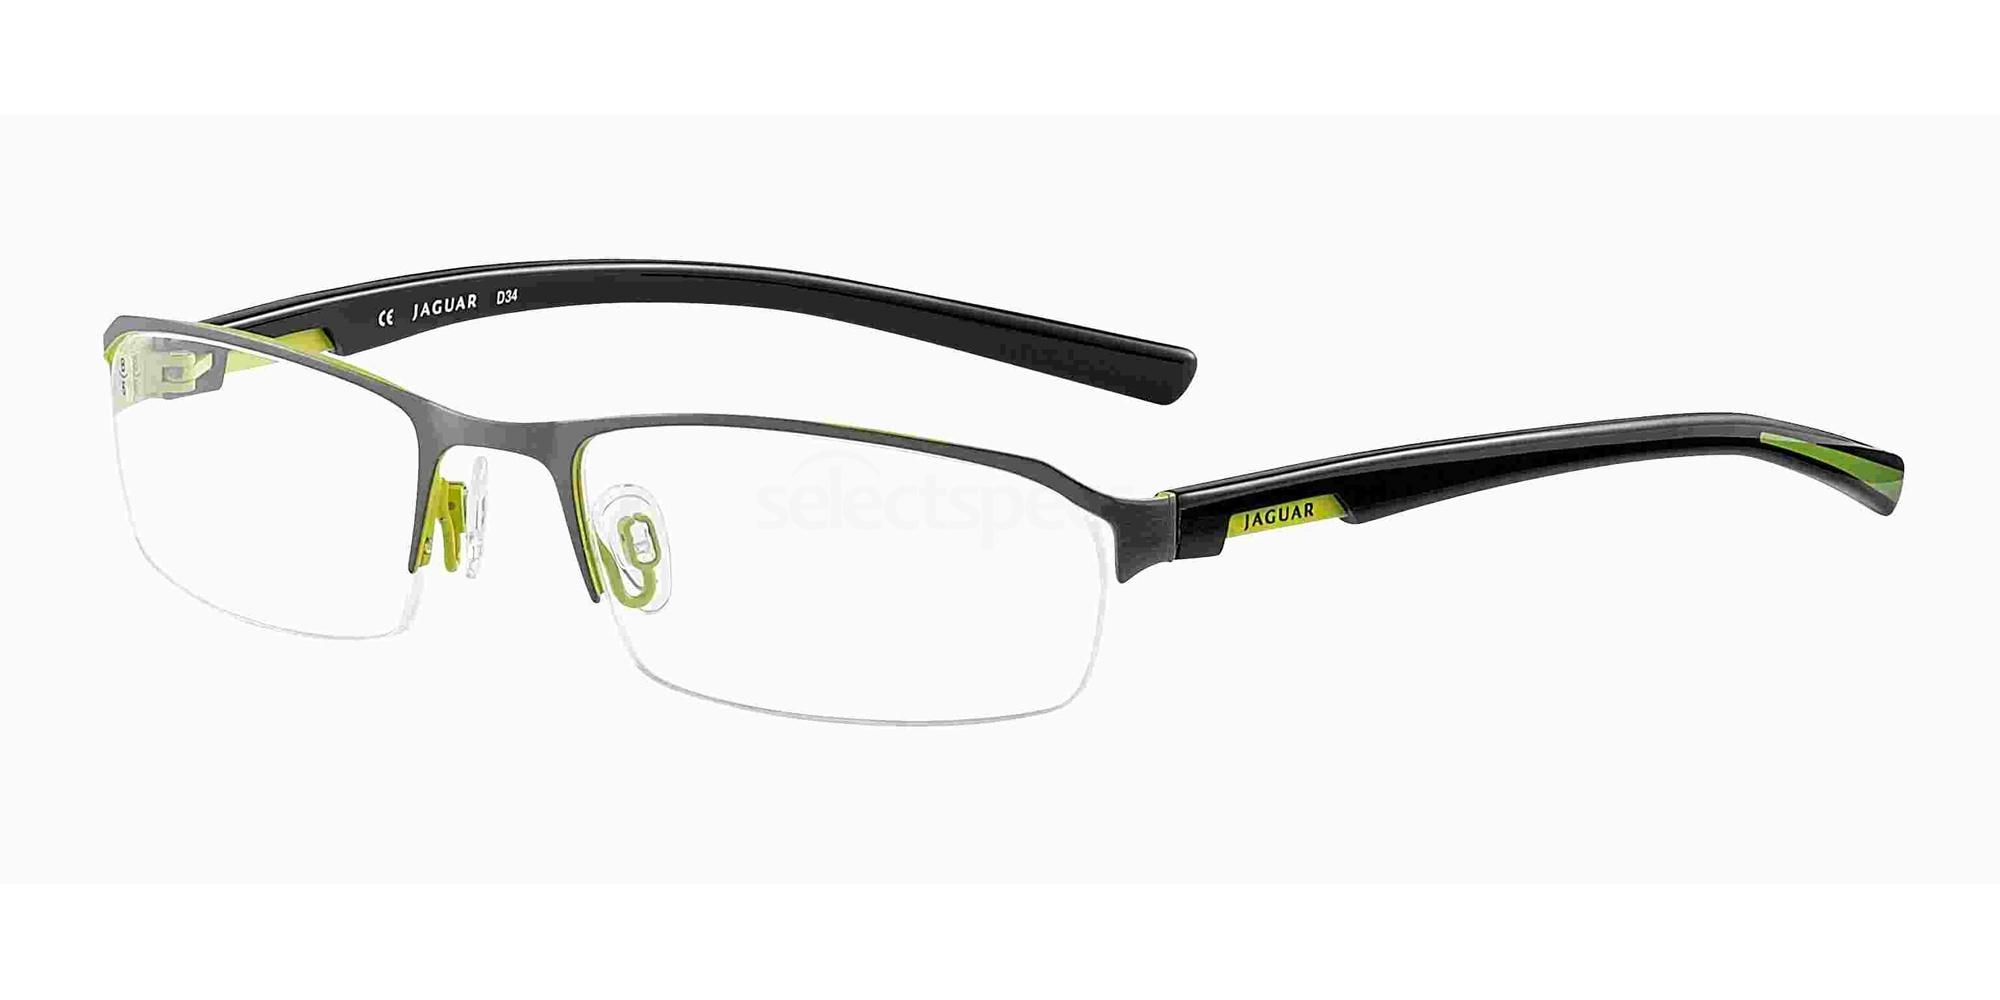 453 33513 Glasses, JAGUAR Eyewear